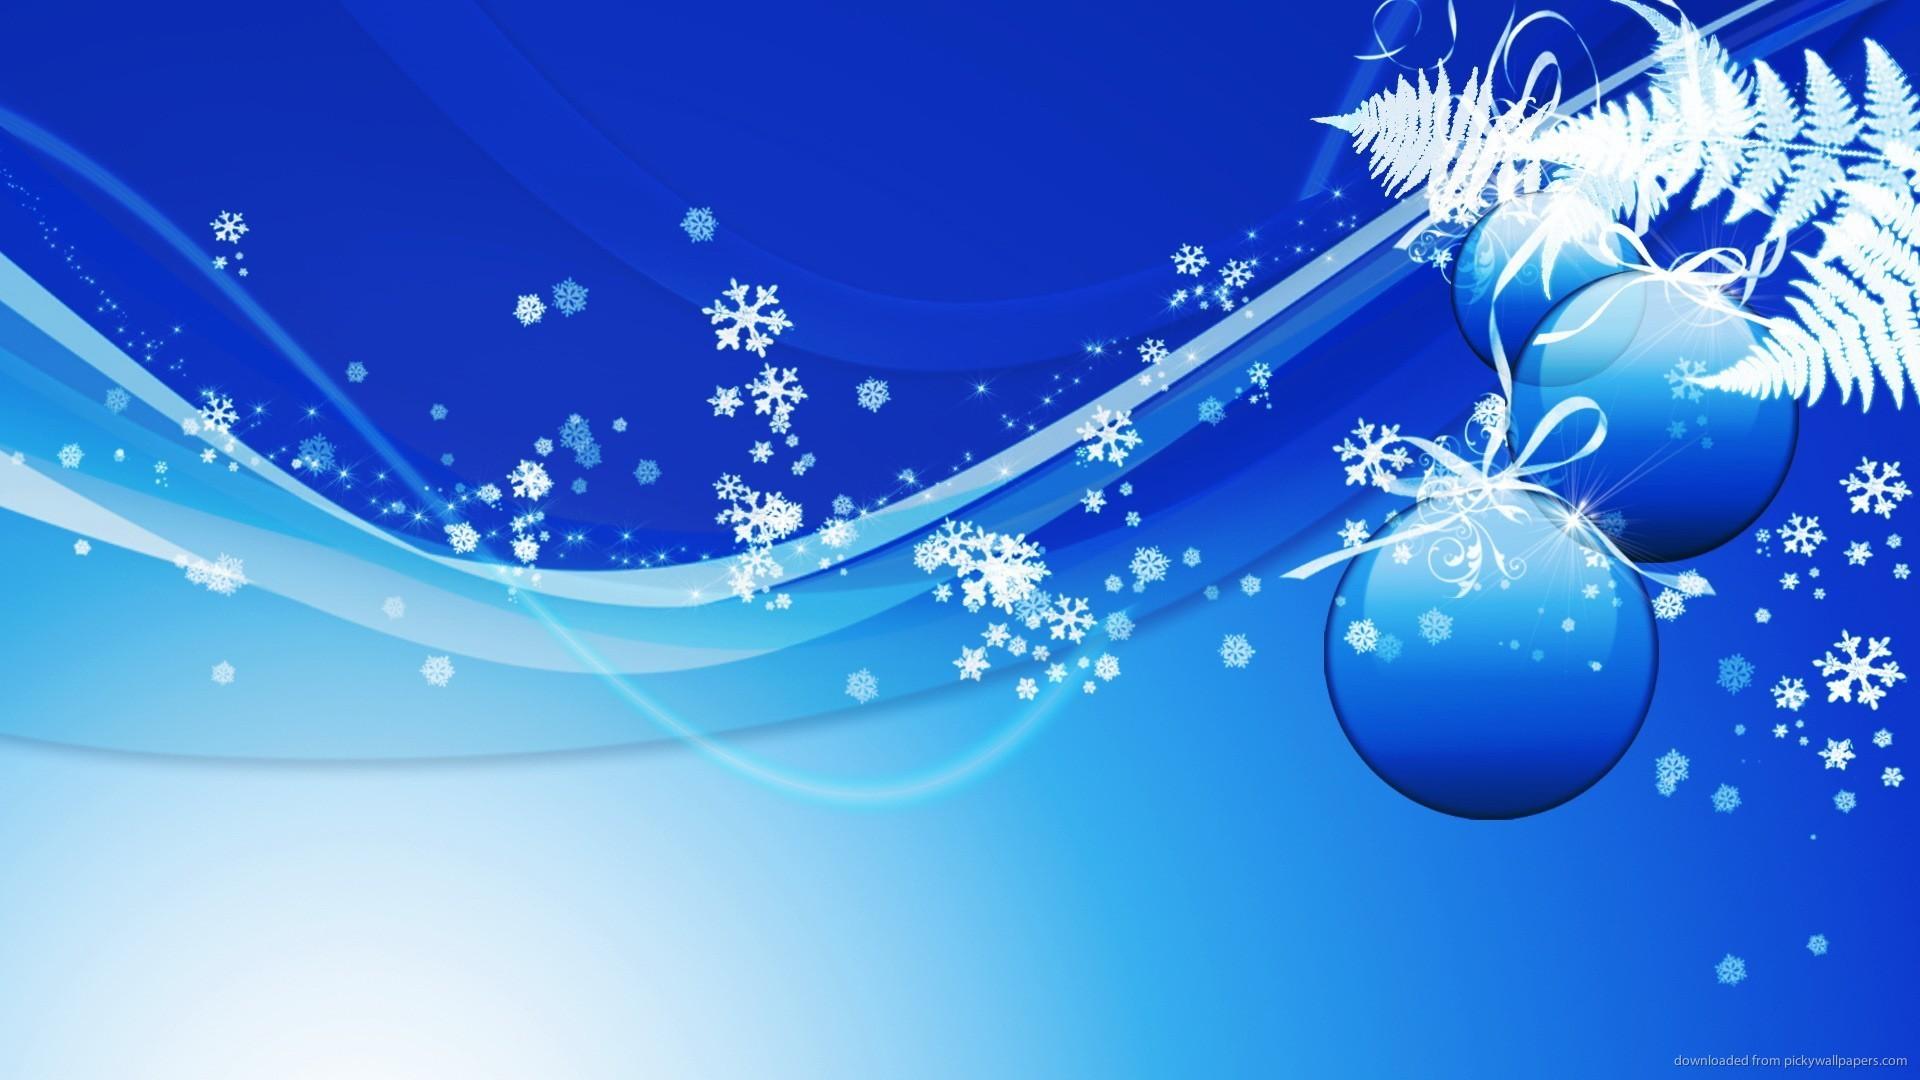 Christmas Ipad Wallpapers: Christmas Background Wallpaper